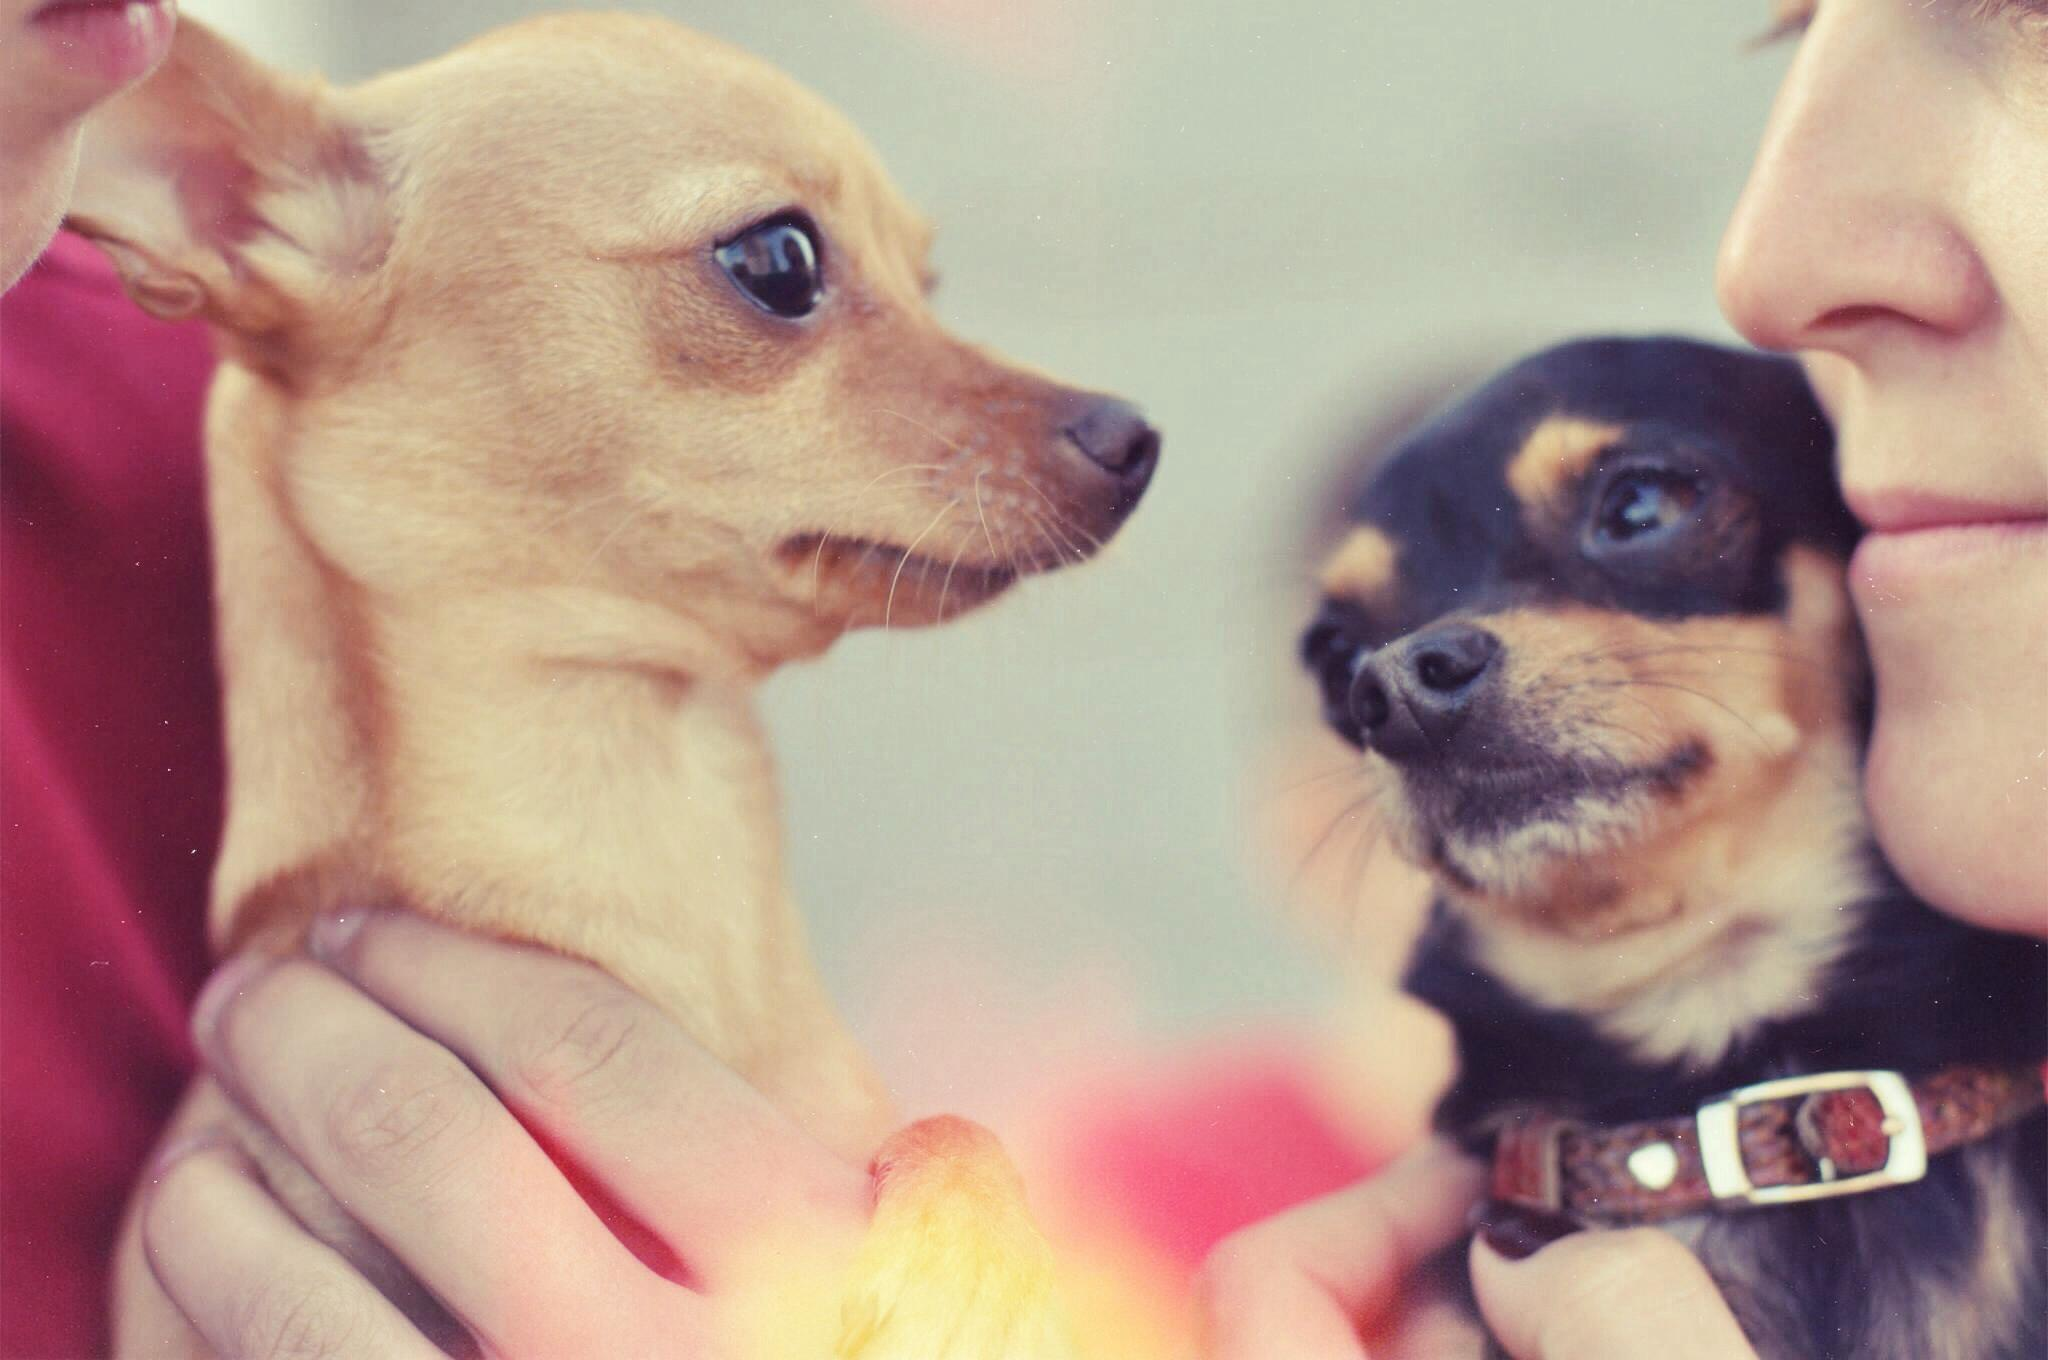 chihuahuaların sosyallestirilmesi-chihuahua-bakimi-mira-burcu-ozcan-socializing-chihuahua-dog-dear-bonie (11)